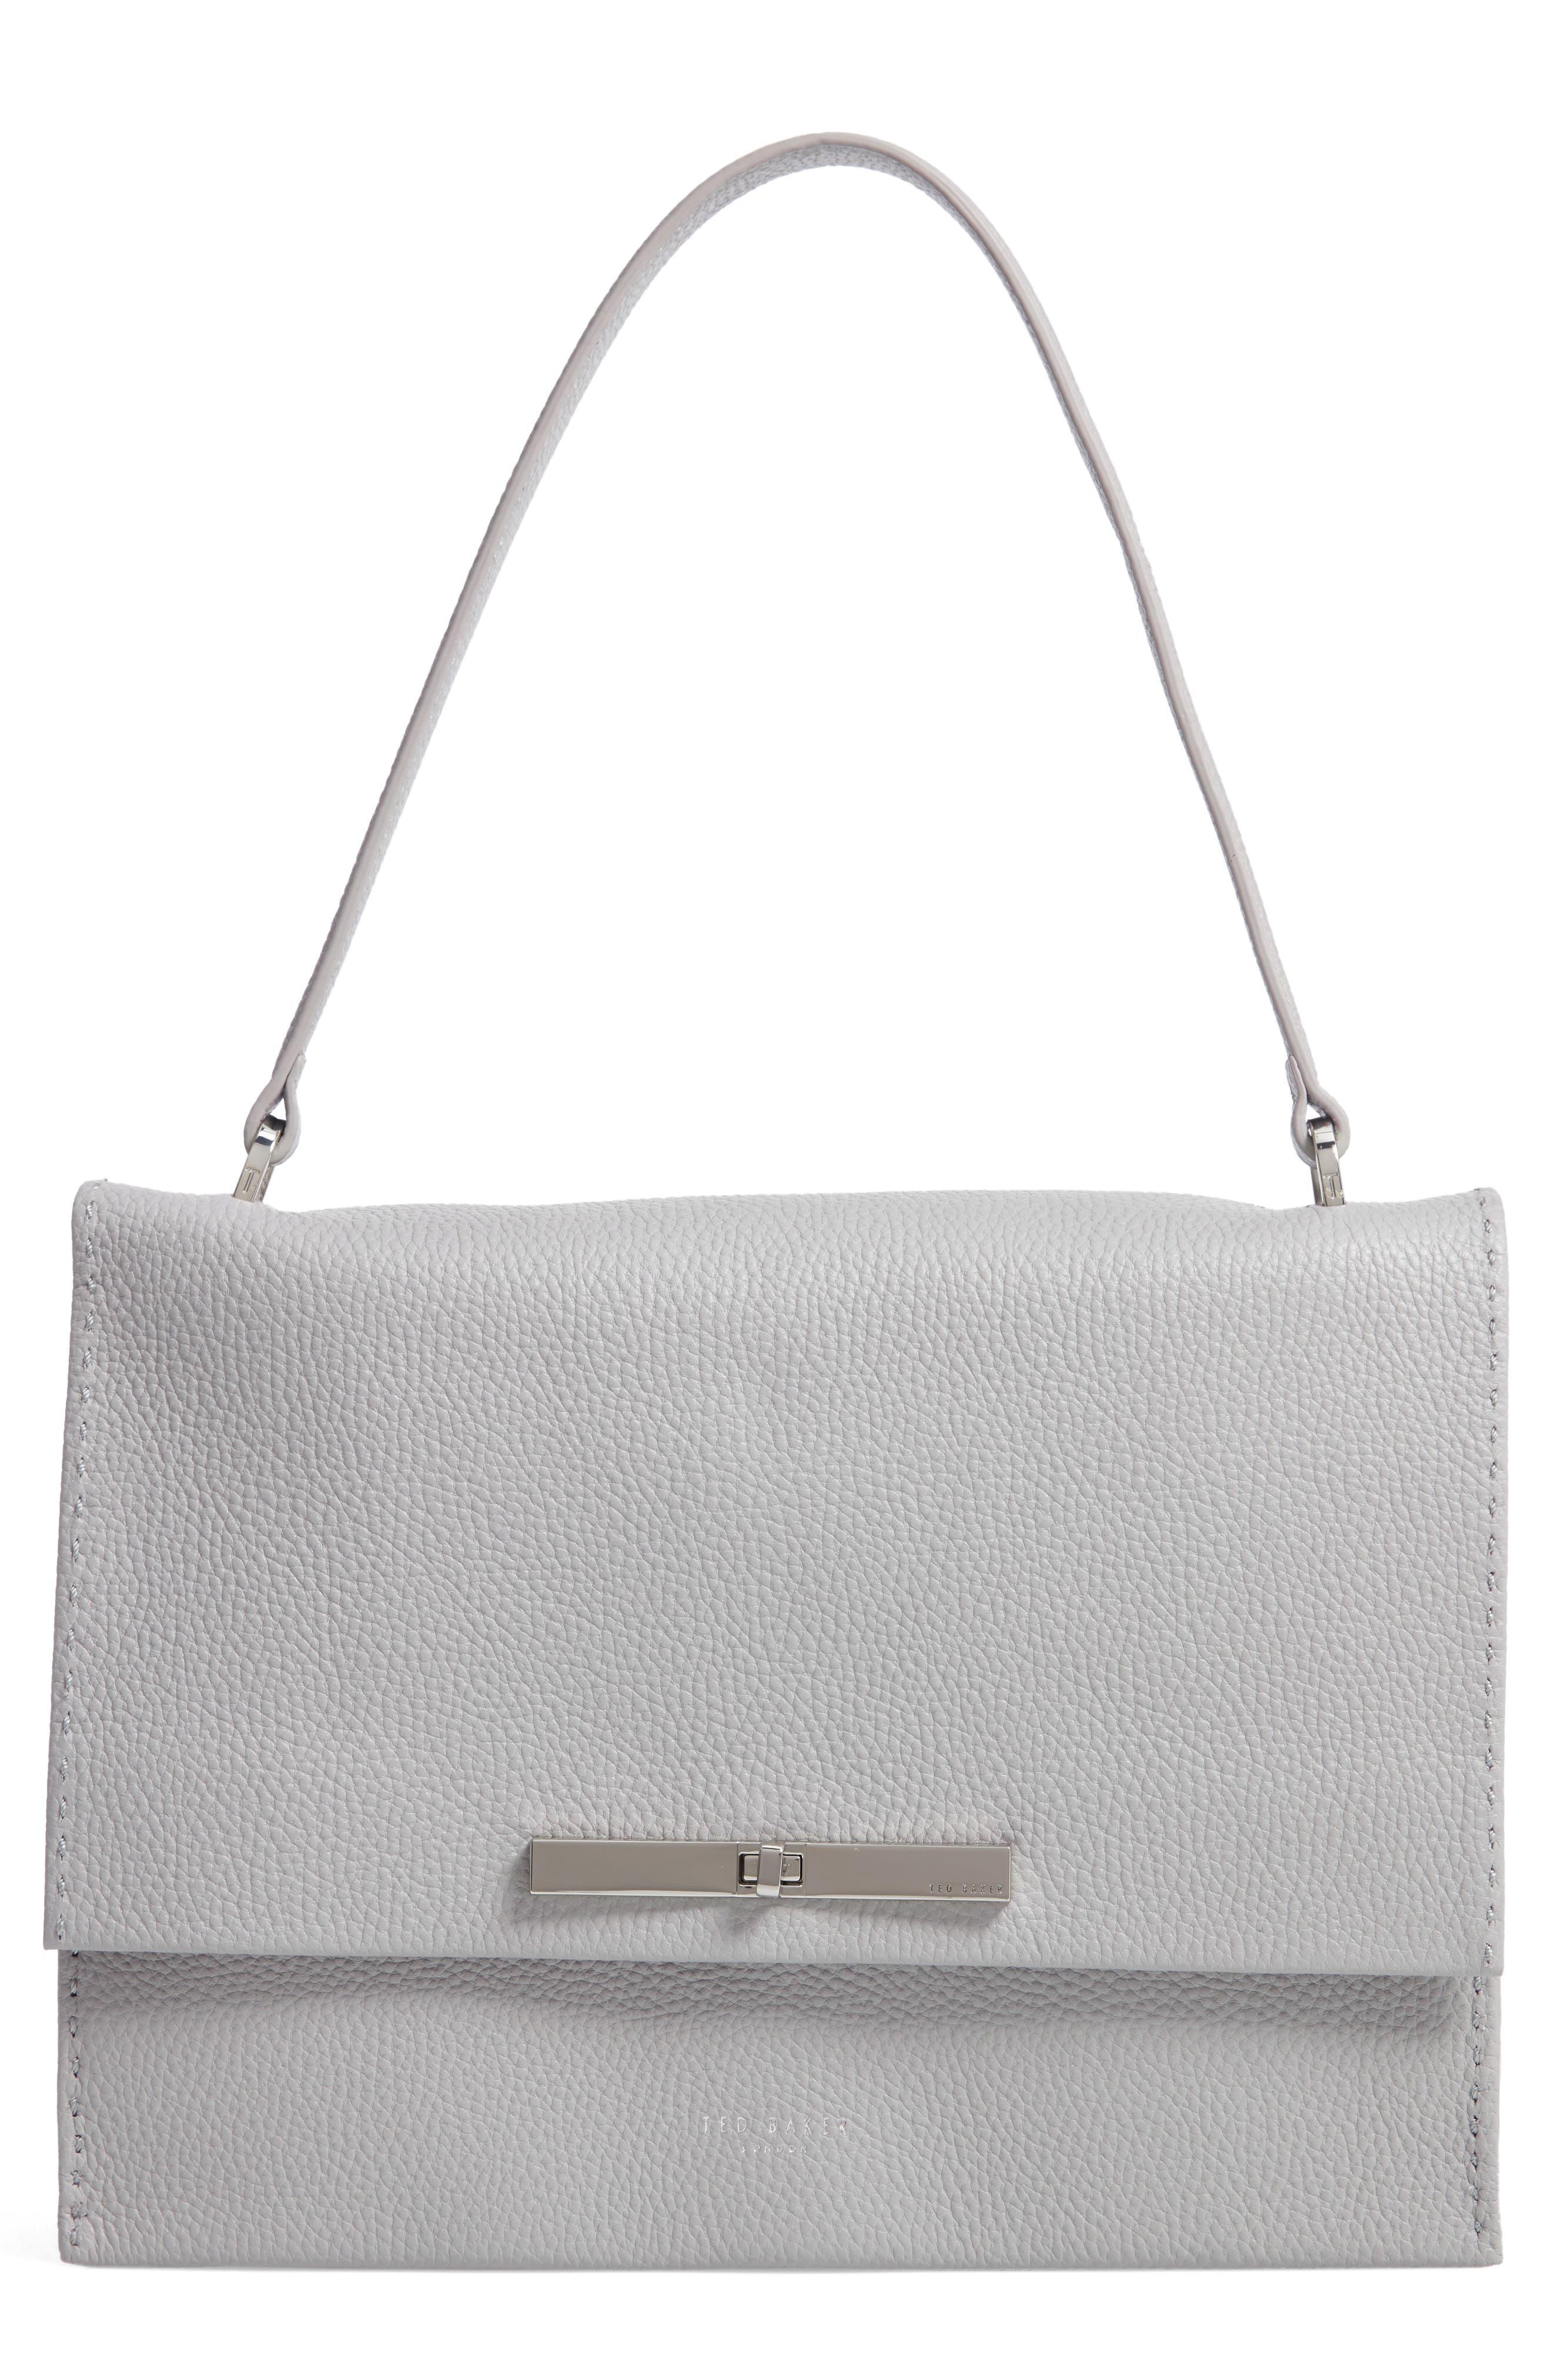 Jessi Leather Shoulder Bag,                             Main thumbnail 1, color,                             GREY